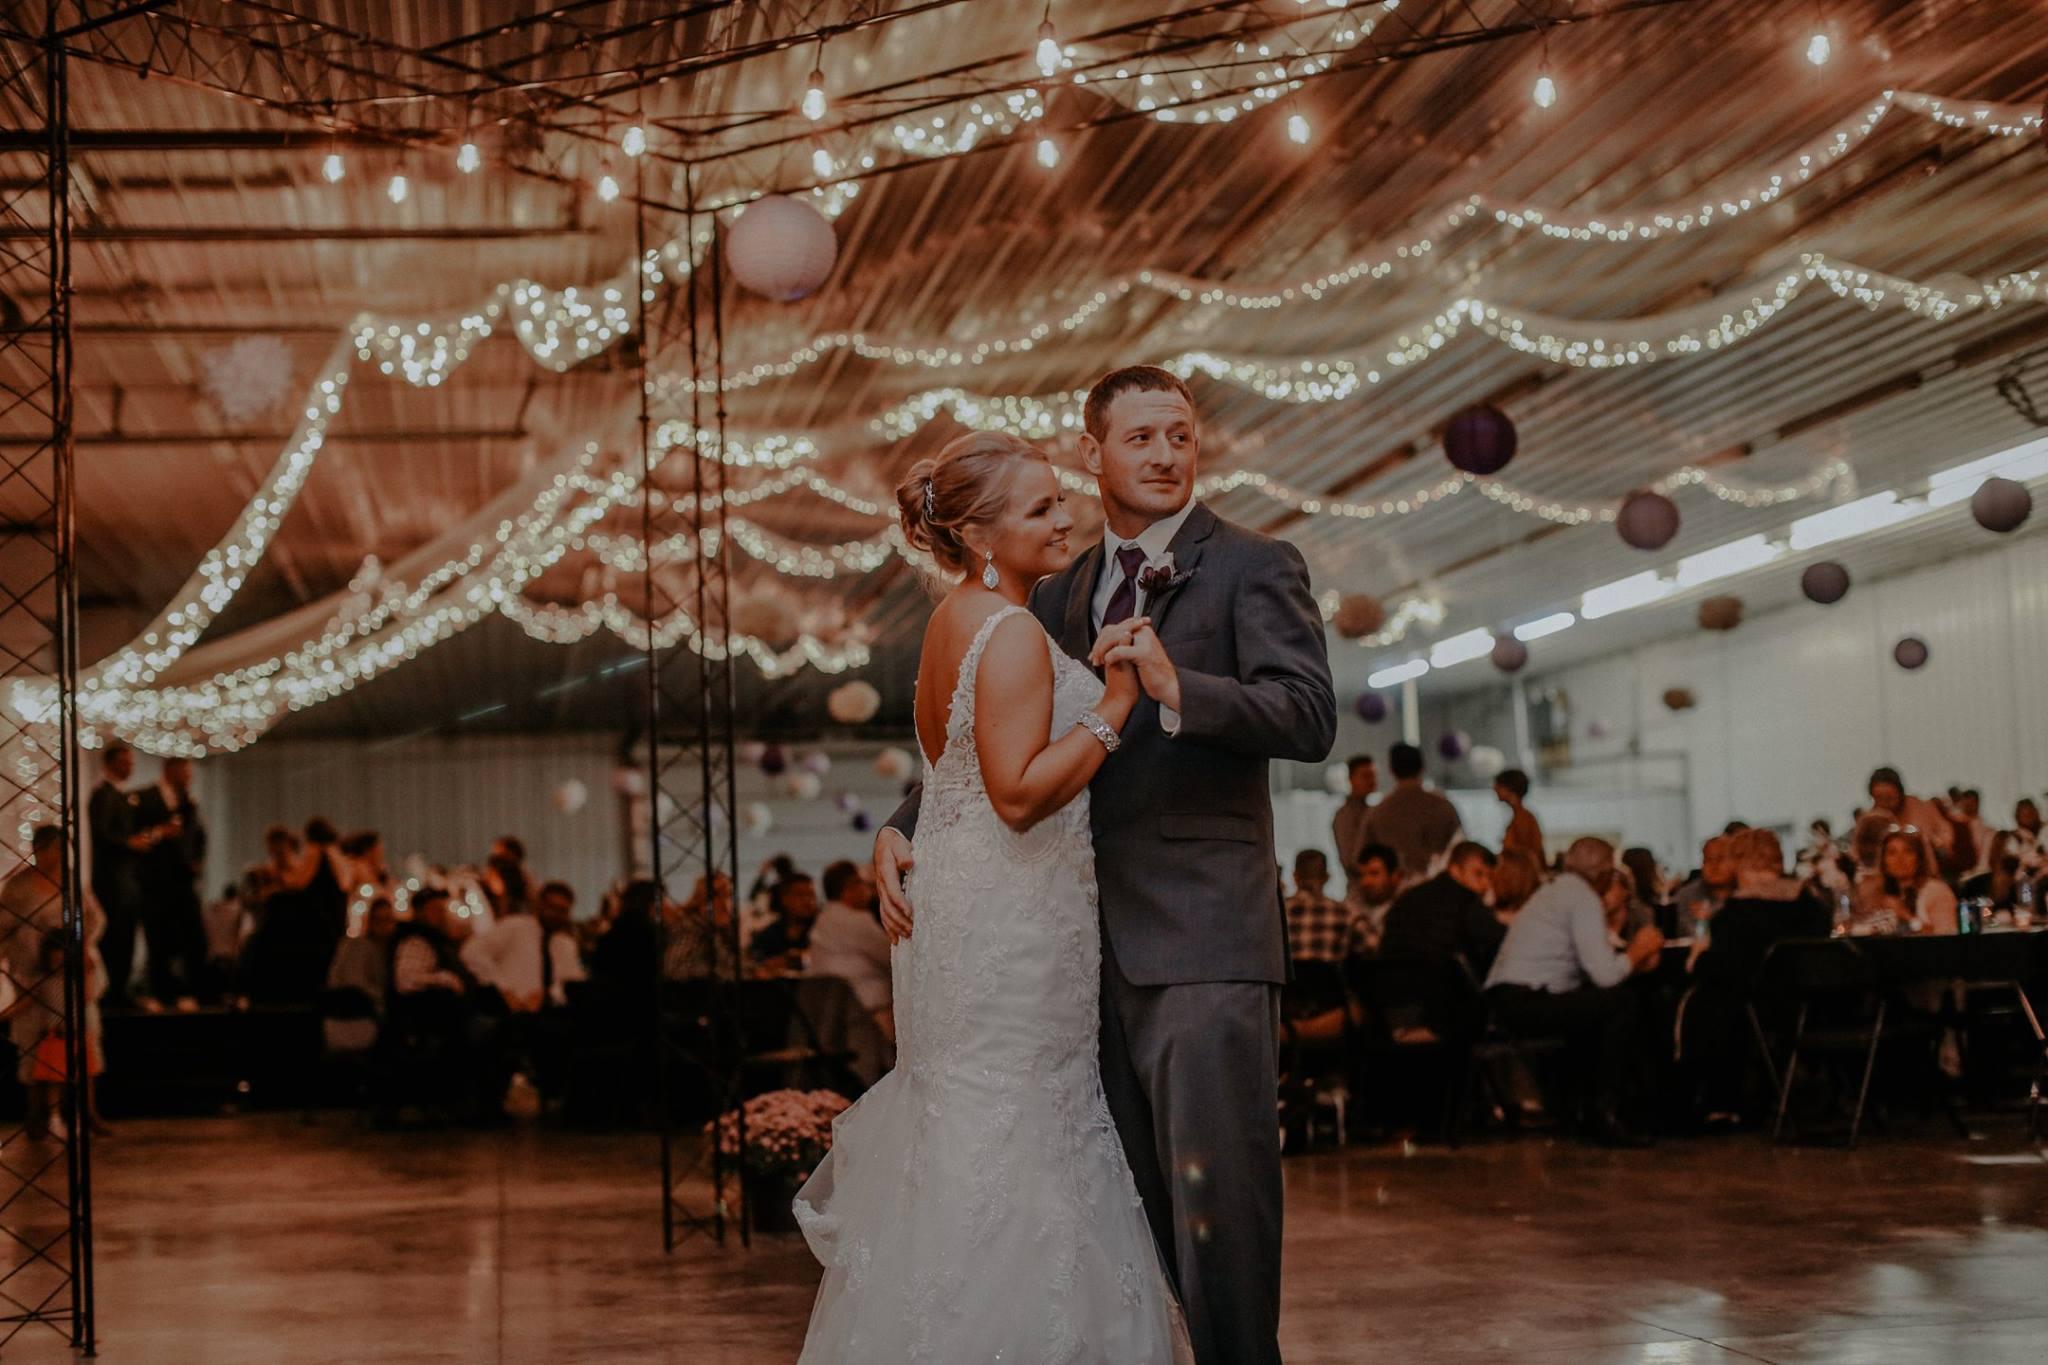 Plan a Wedding - Amana RV Park